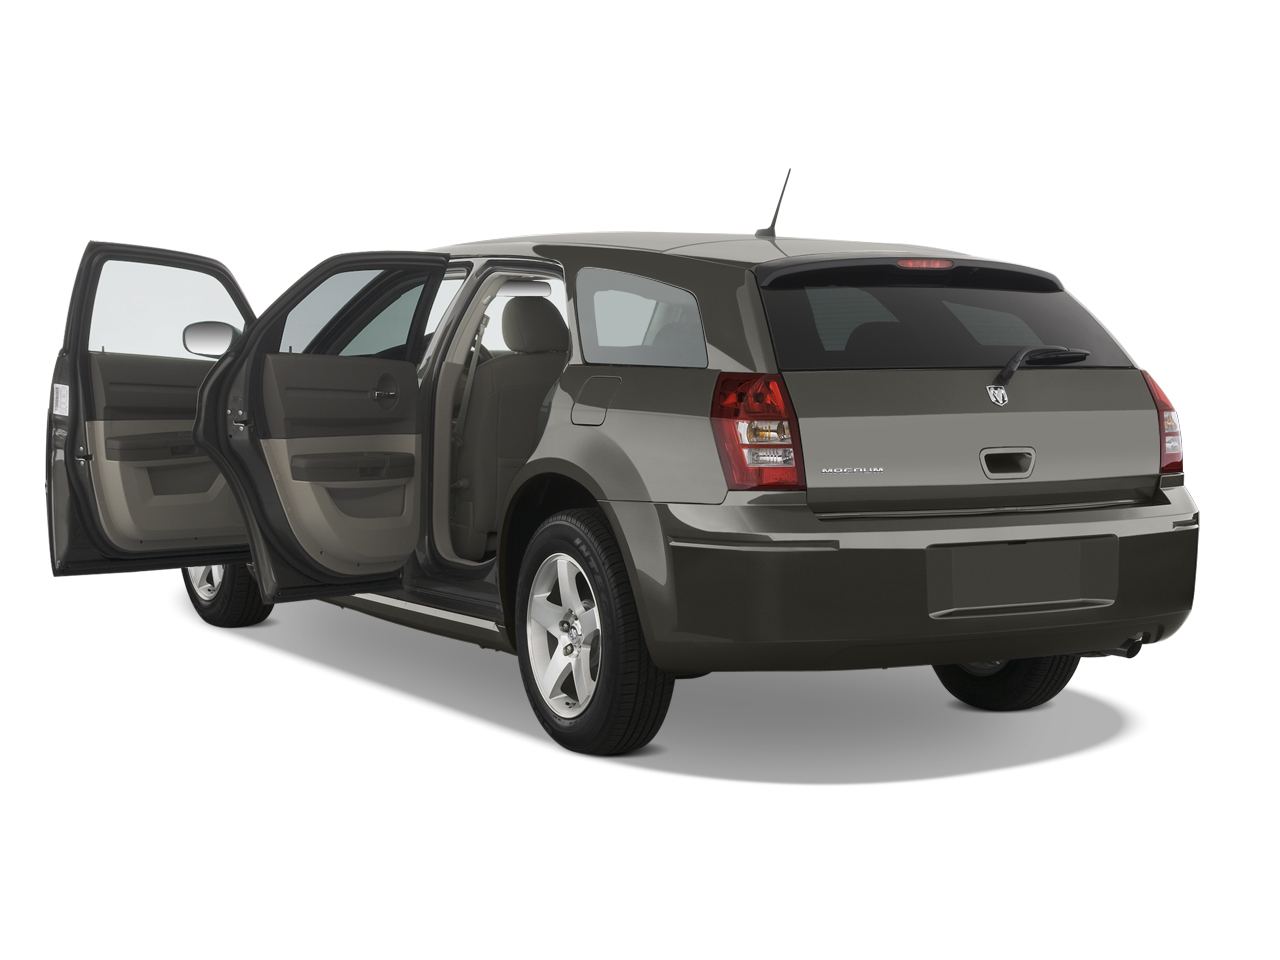 automotive magnum az dodge veh sxt wagon american in llc tucson